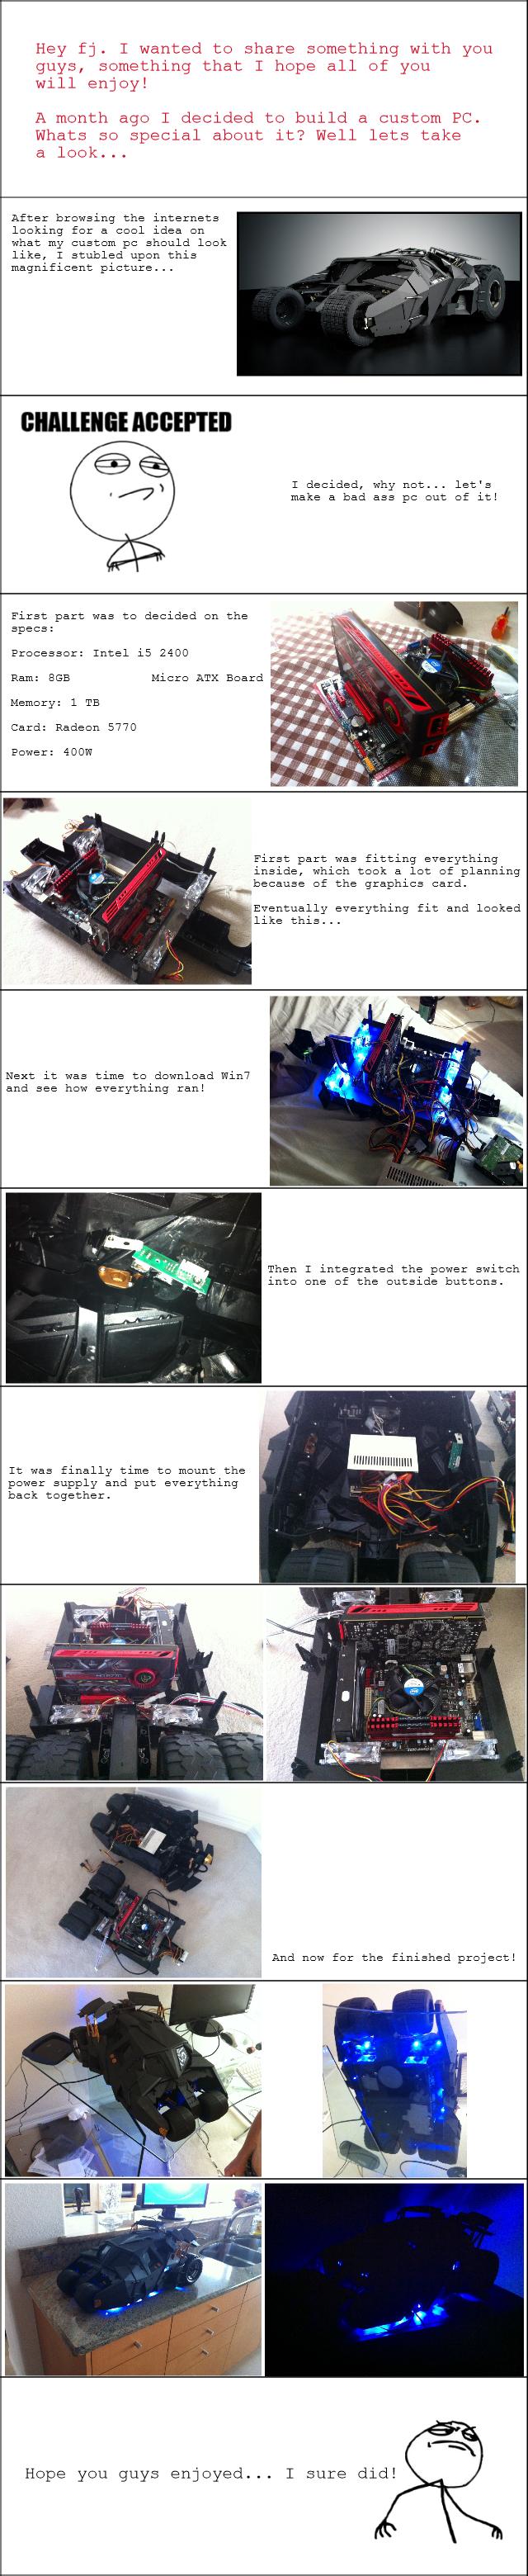 Batman Tumbler. Custom PC I built, hope you all like it!. meow